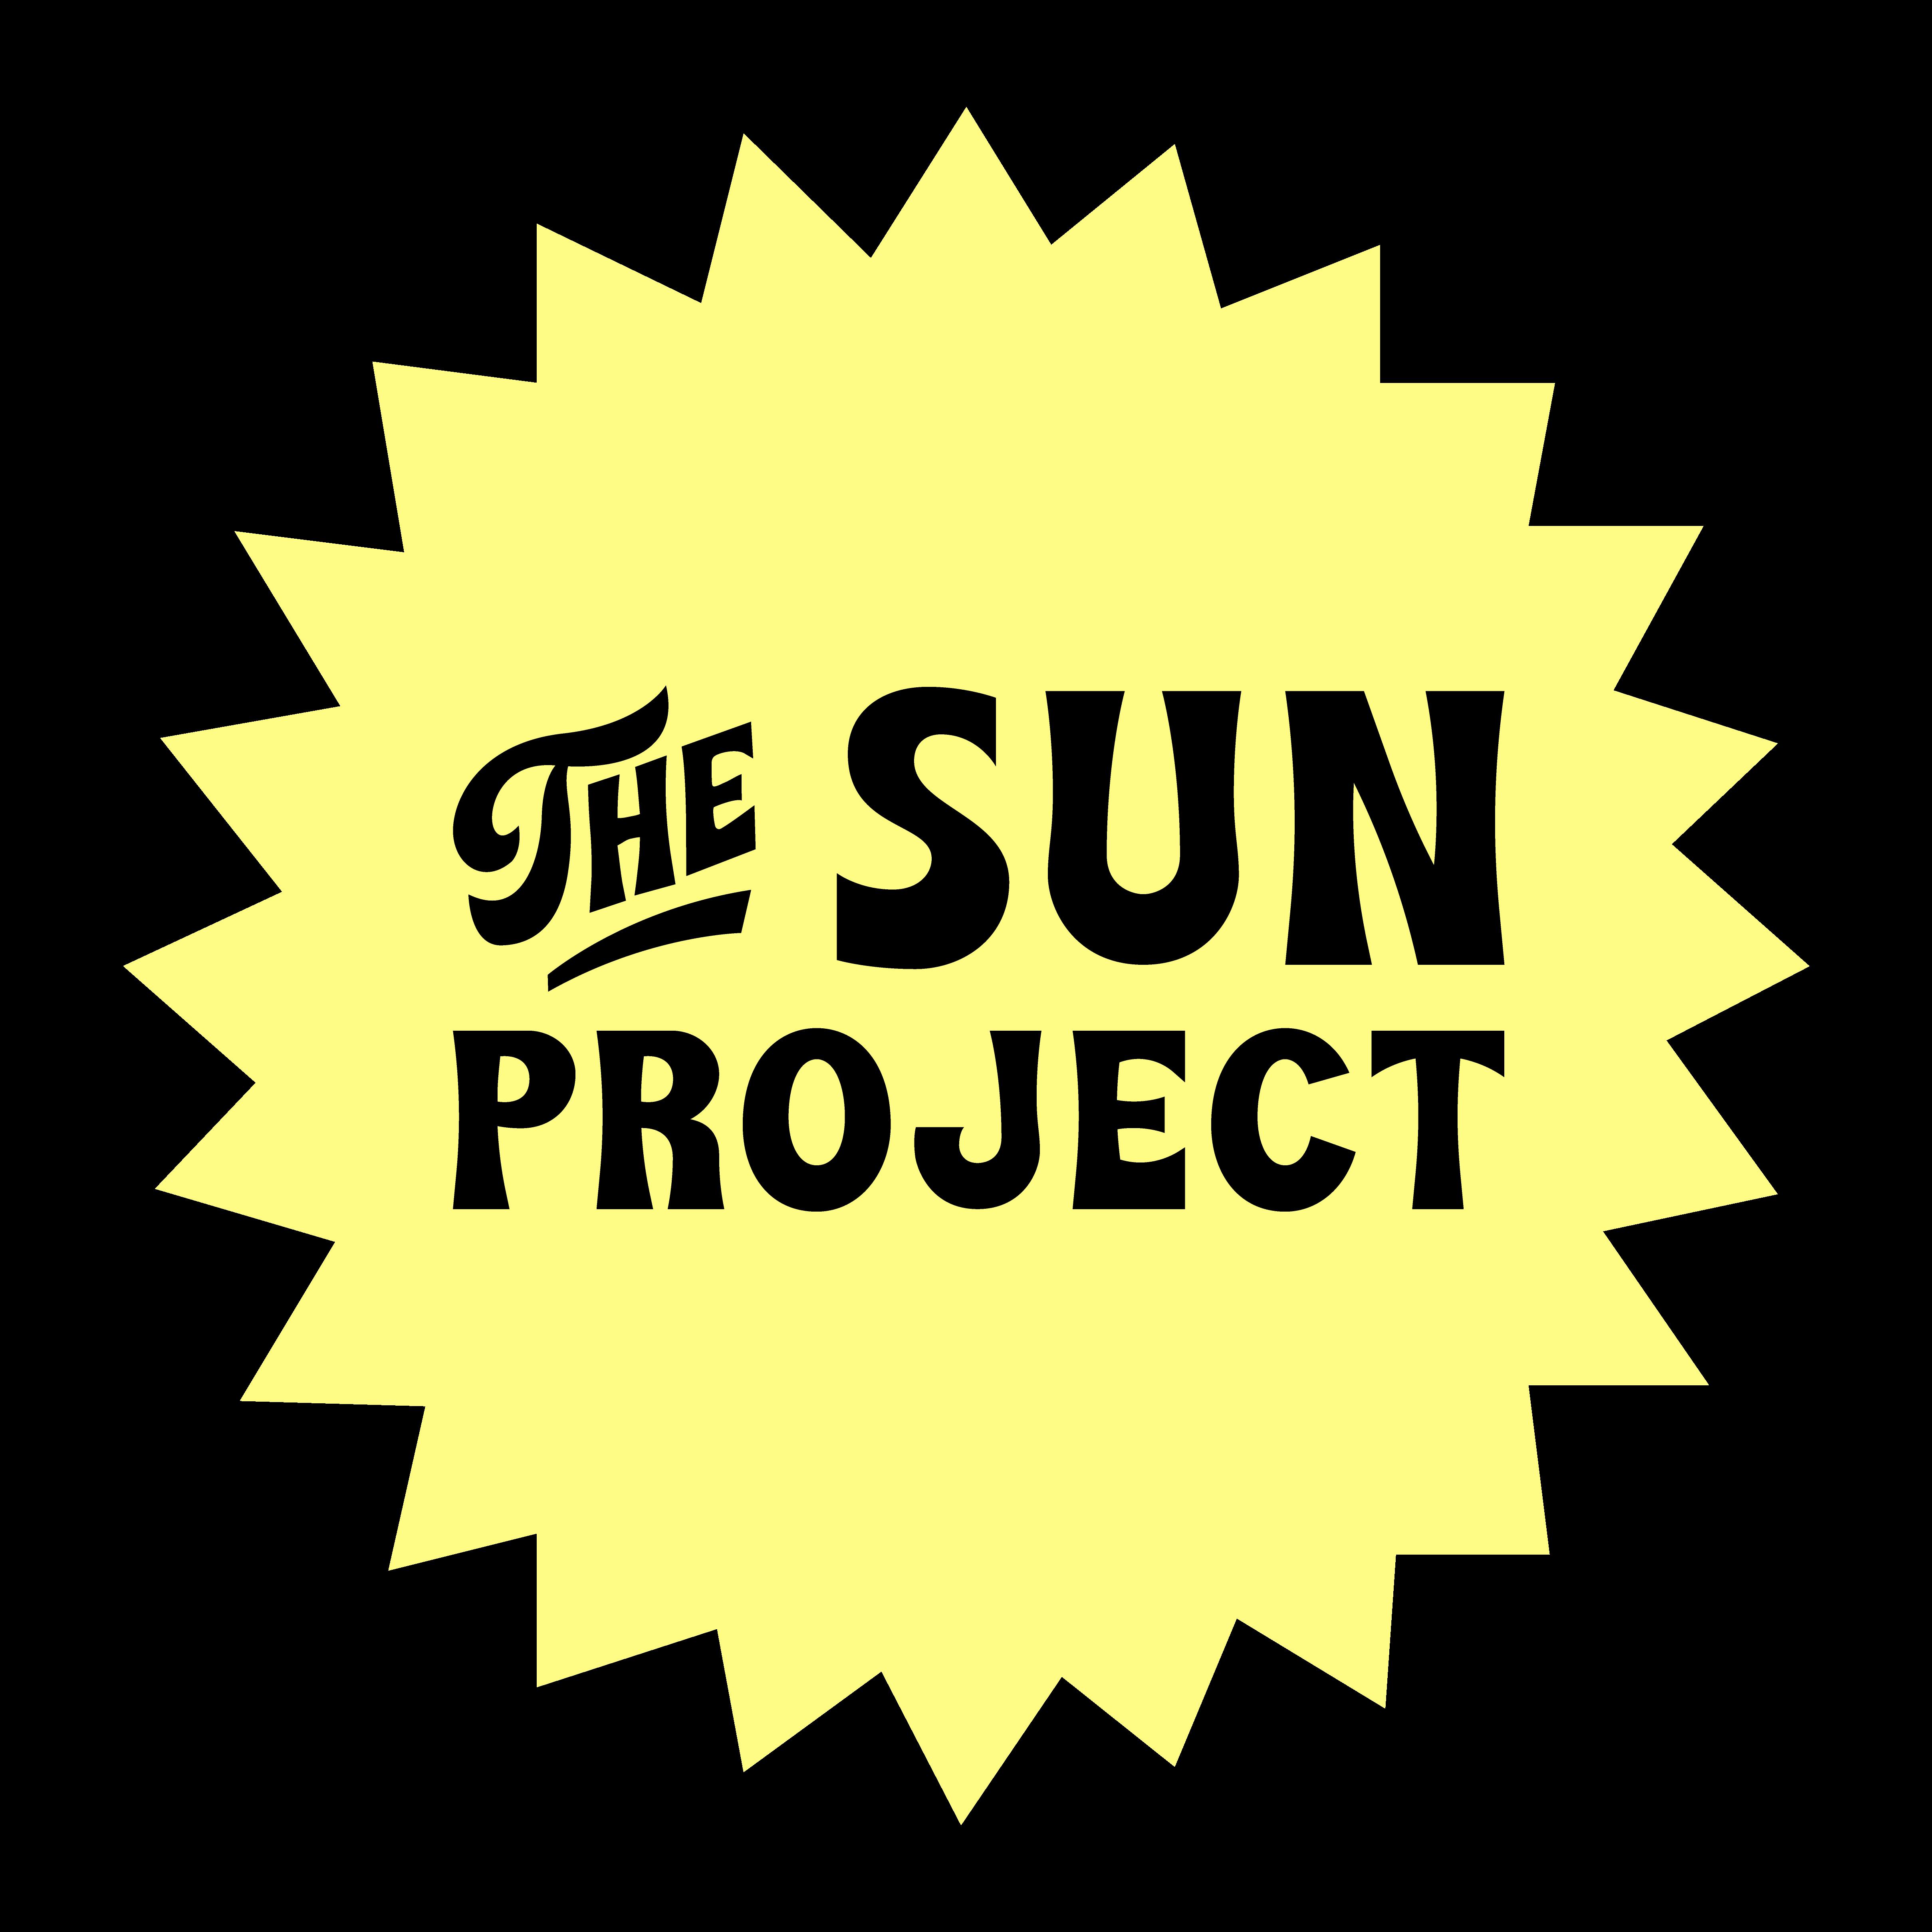 The sun project